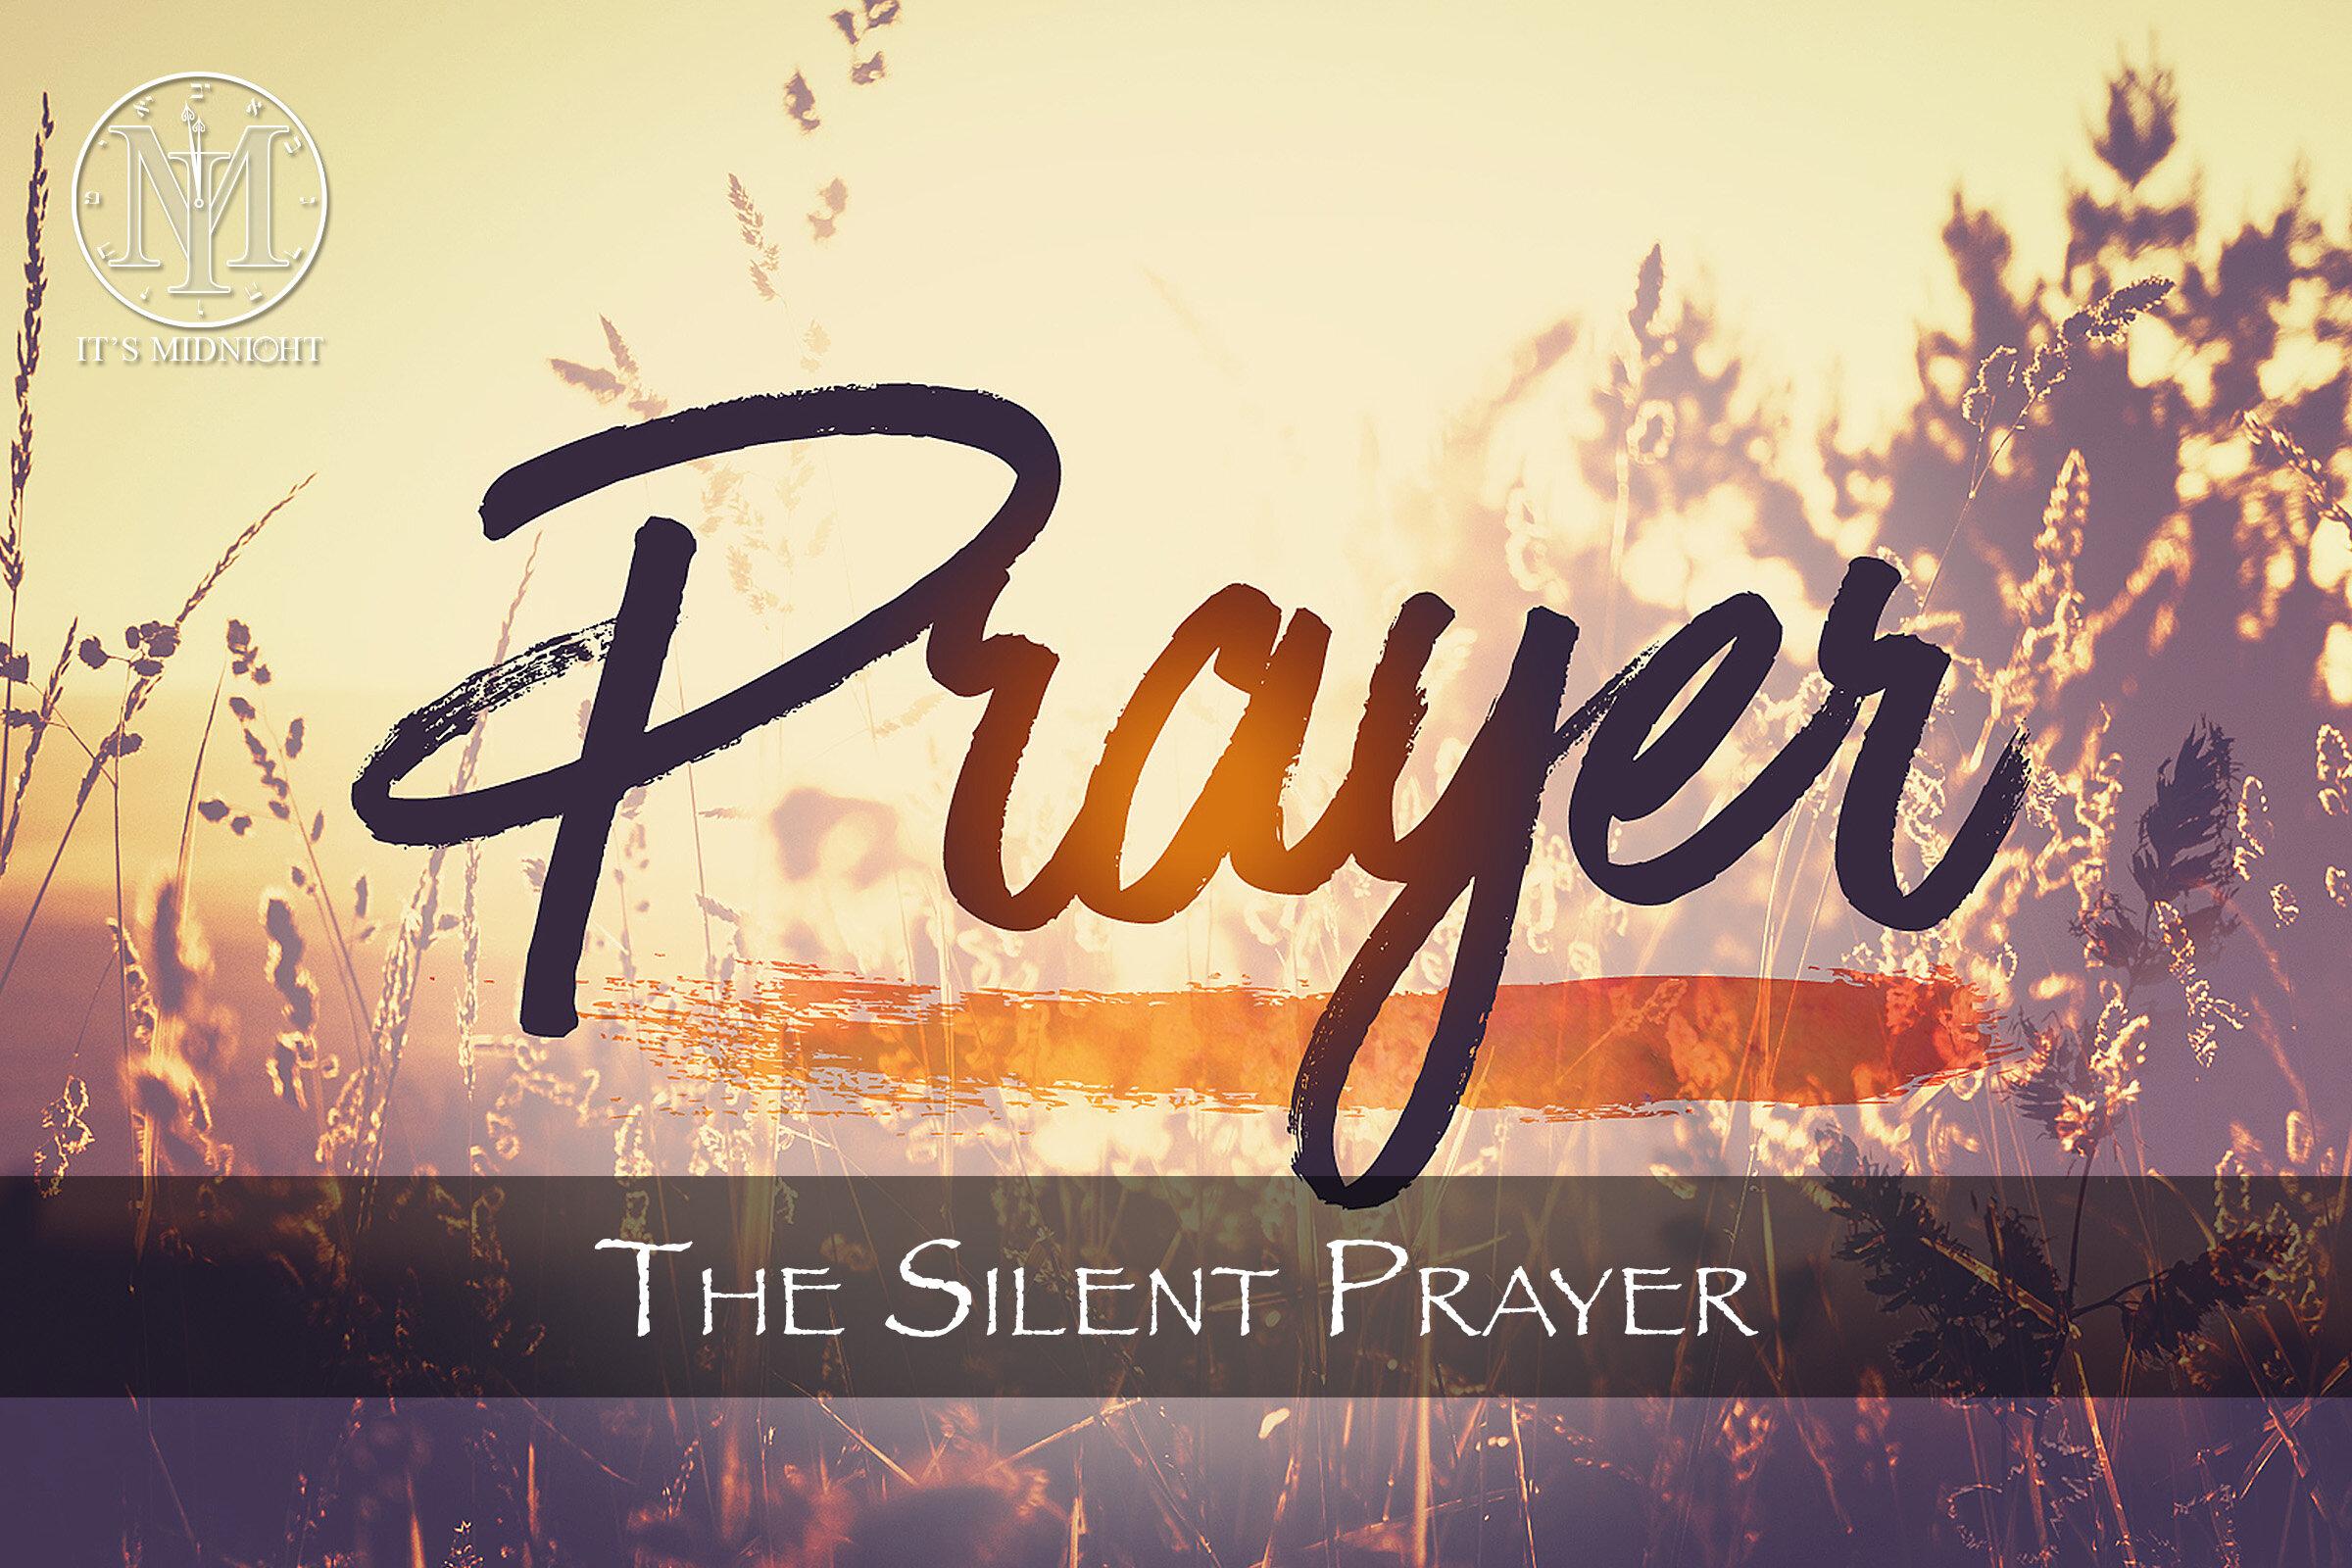 The Silent Prayer Thumbnail (It's Midnight Ministries).jpg